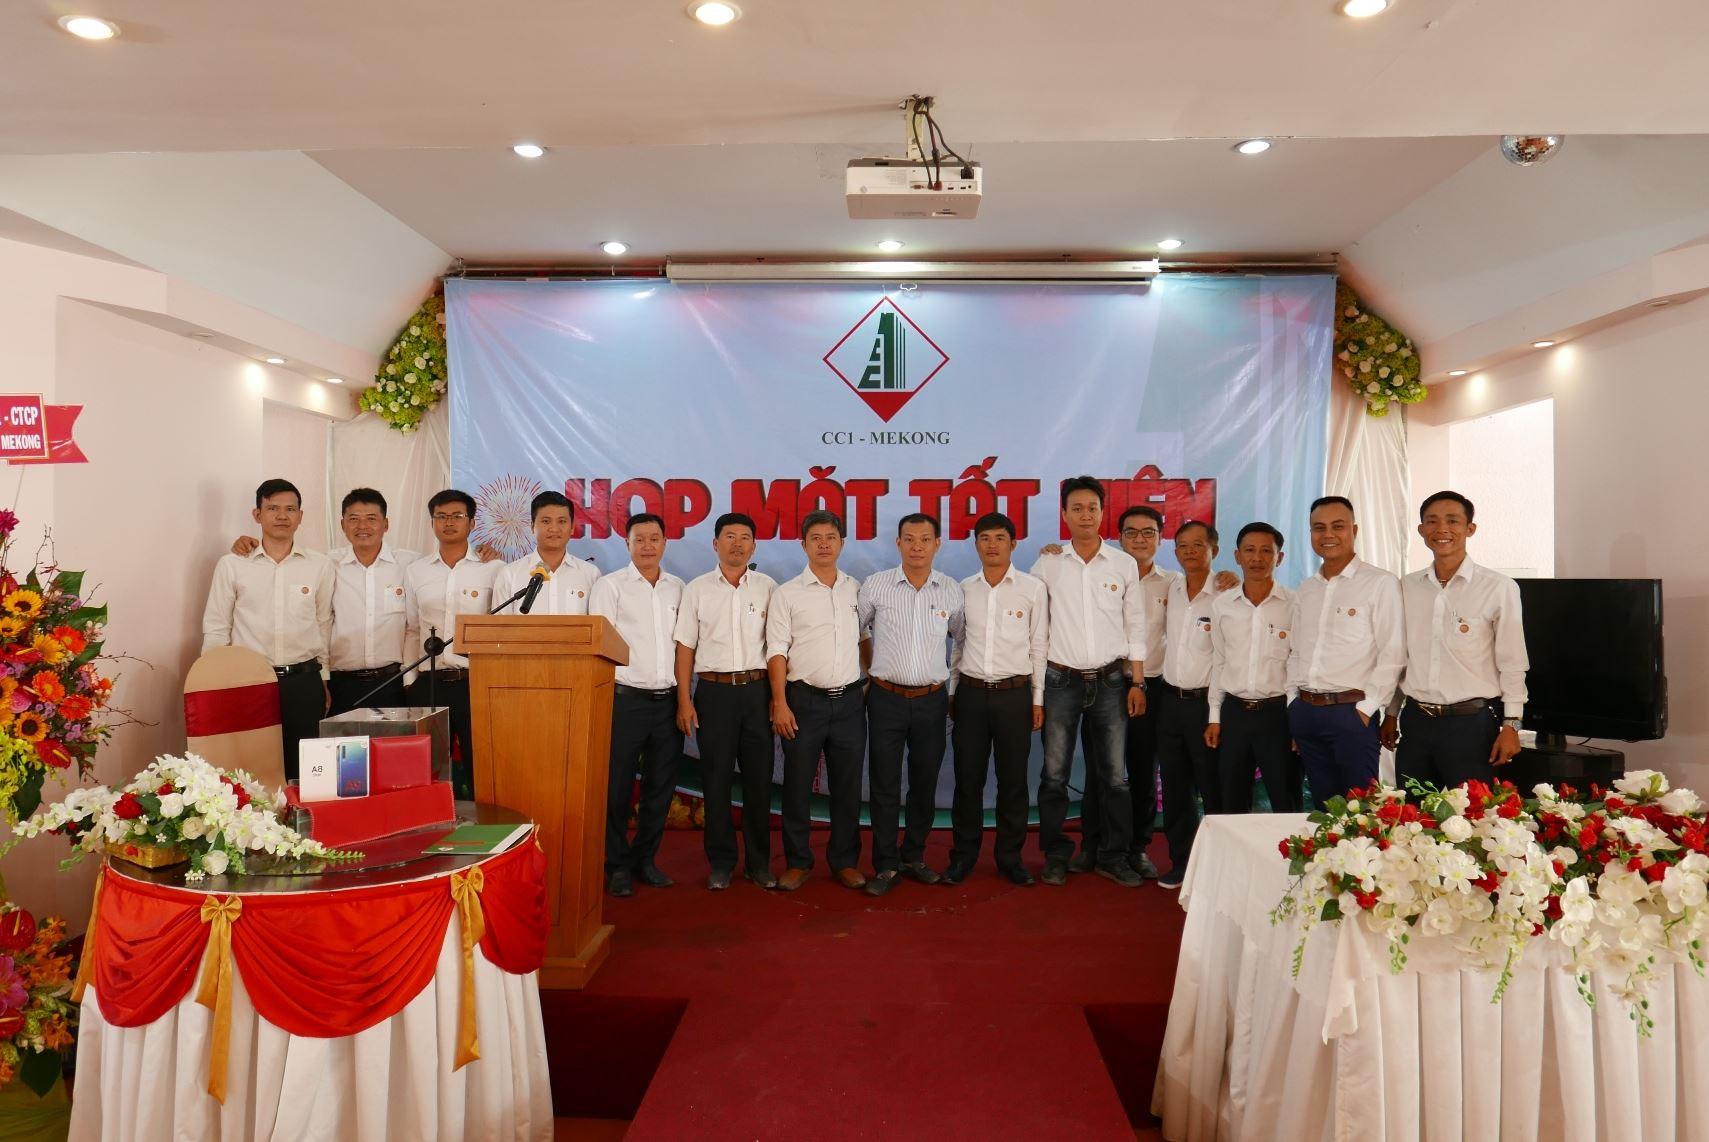 tat-nien-2019-cc1-mekong (5)